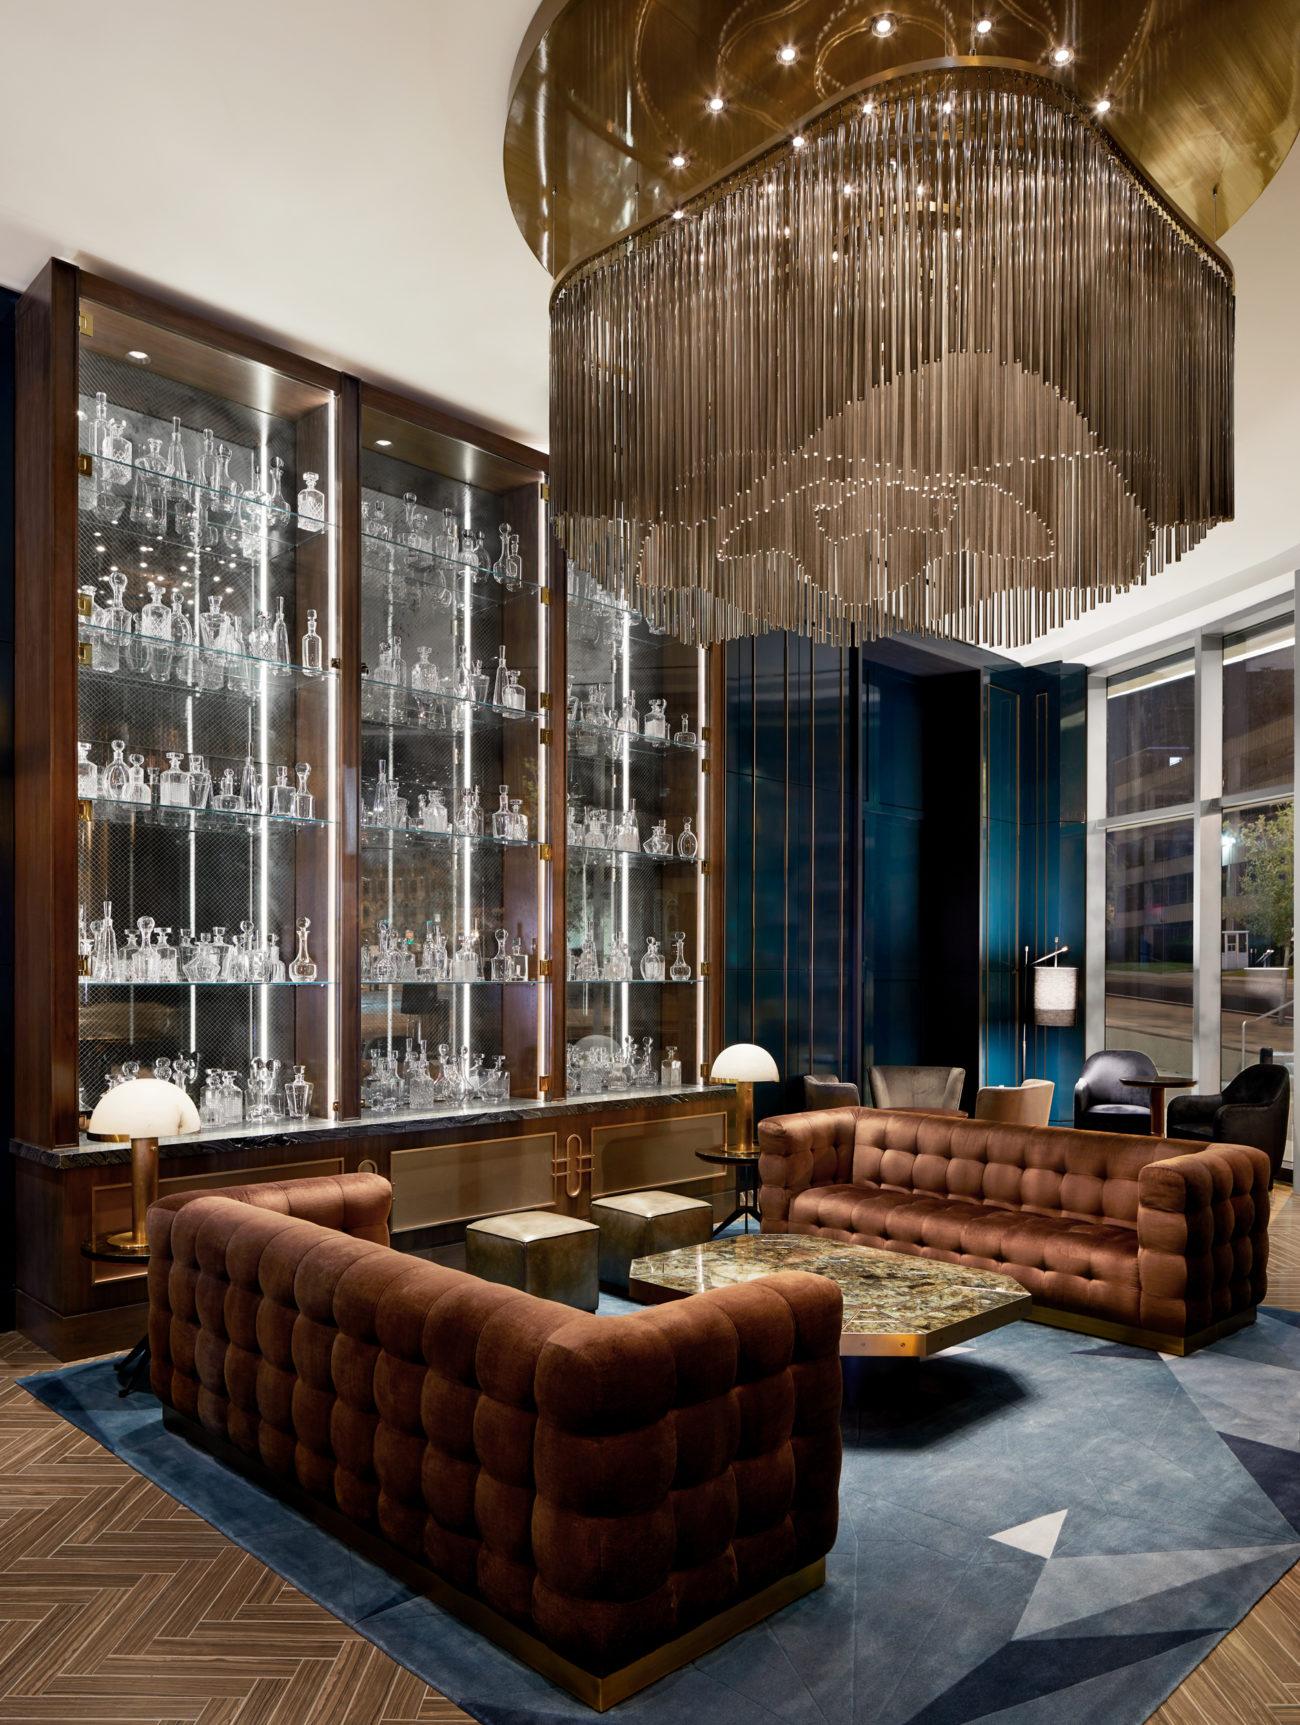 JW Marriott Nashville, Interior Design by Stonehill Taylor